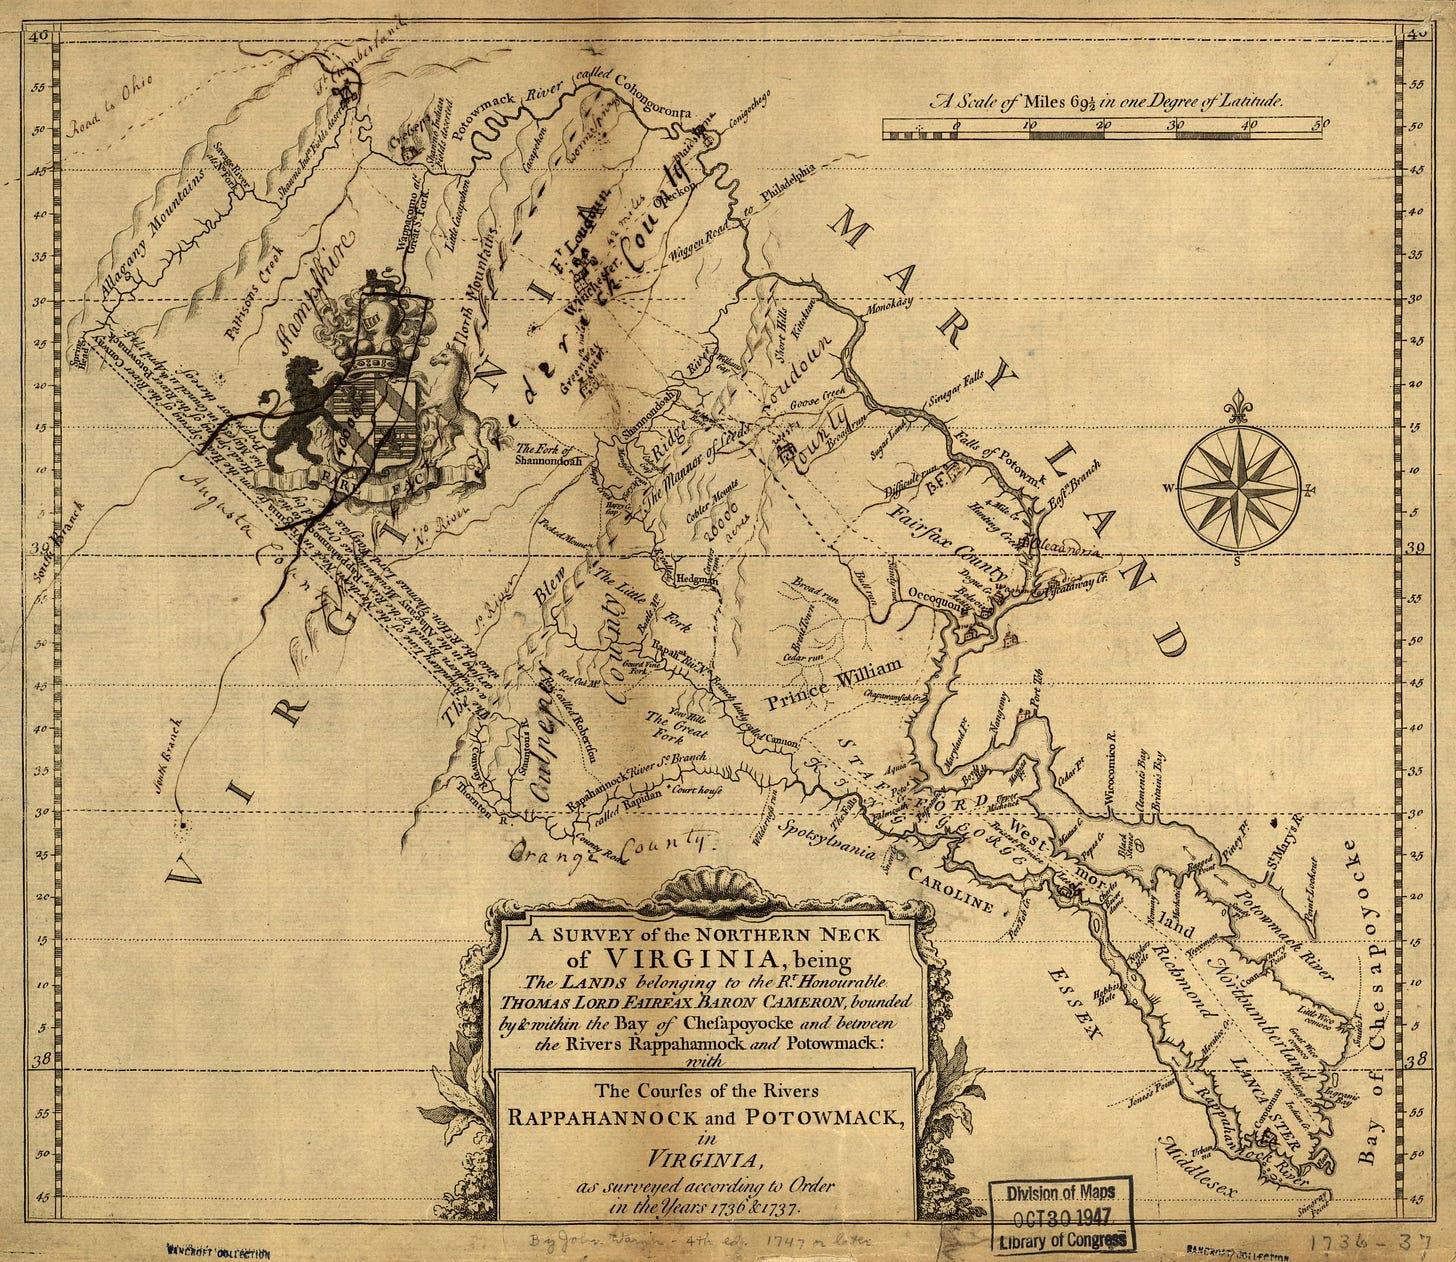 Survey of Northern Neck